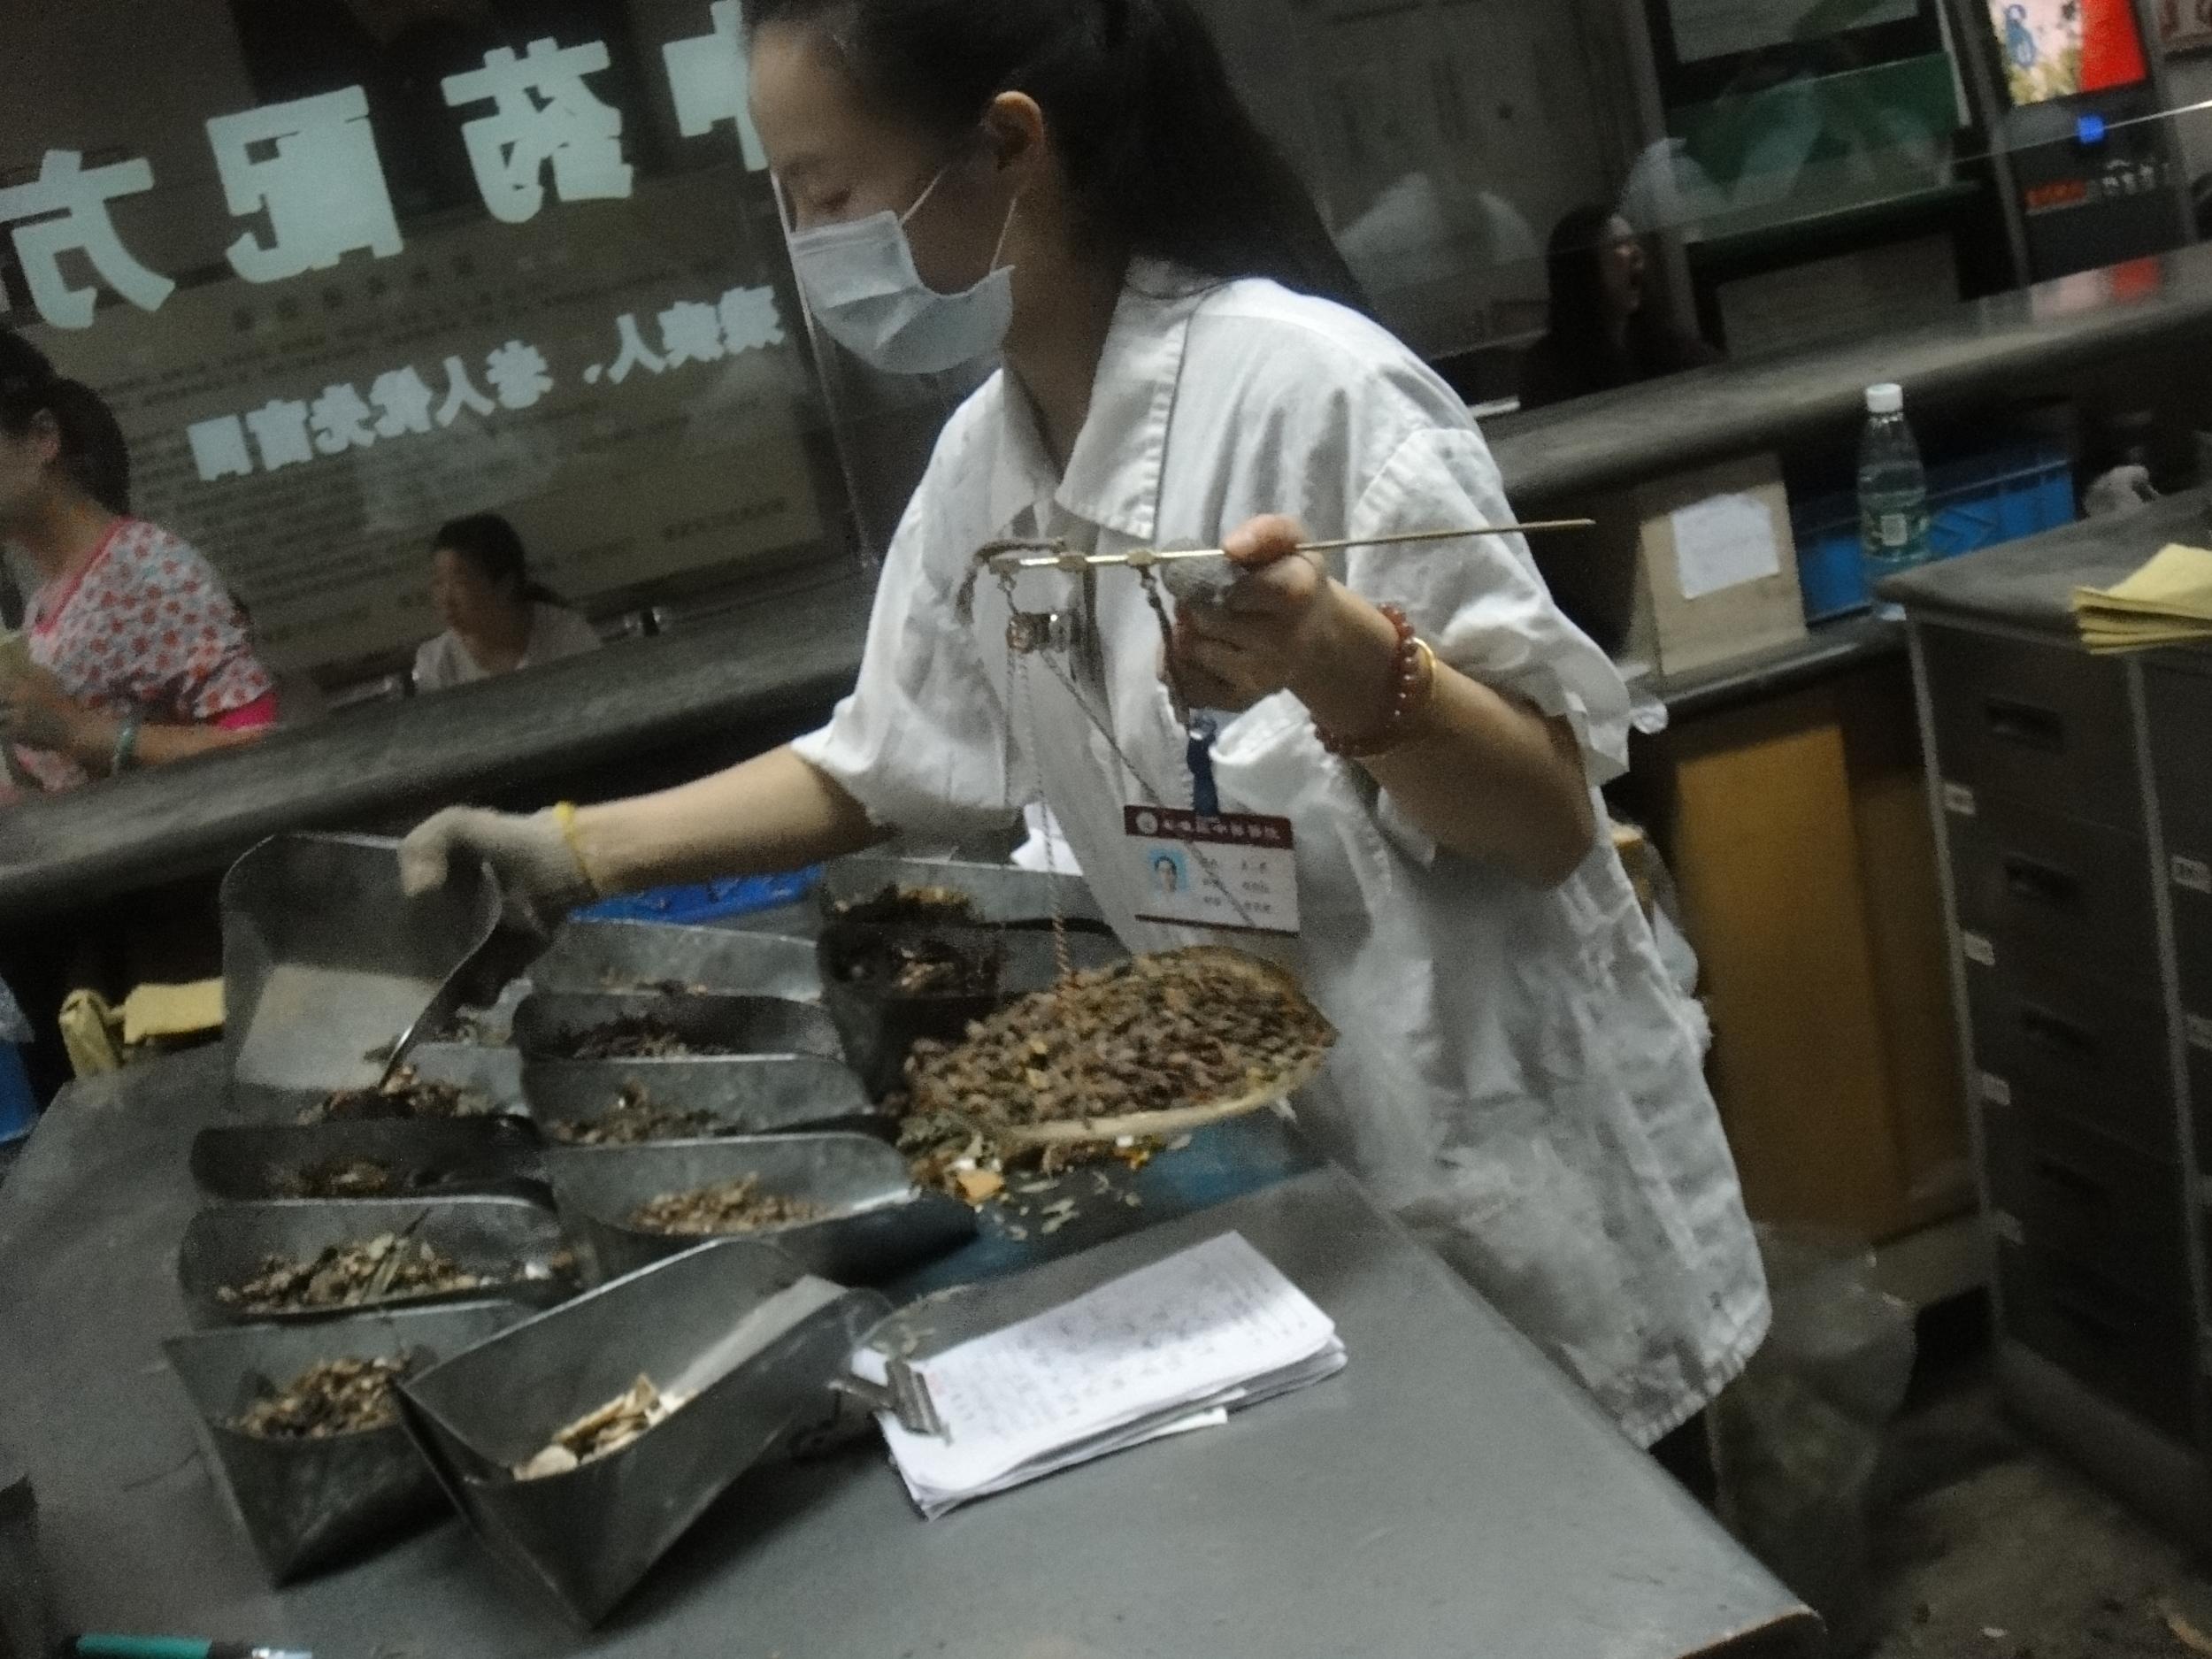 A woman weighs and dispenses Chinese herbs at Qin Huai Hospital in Nanjing, China.